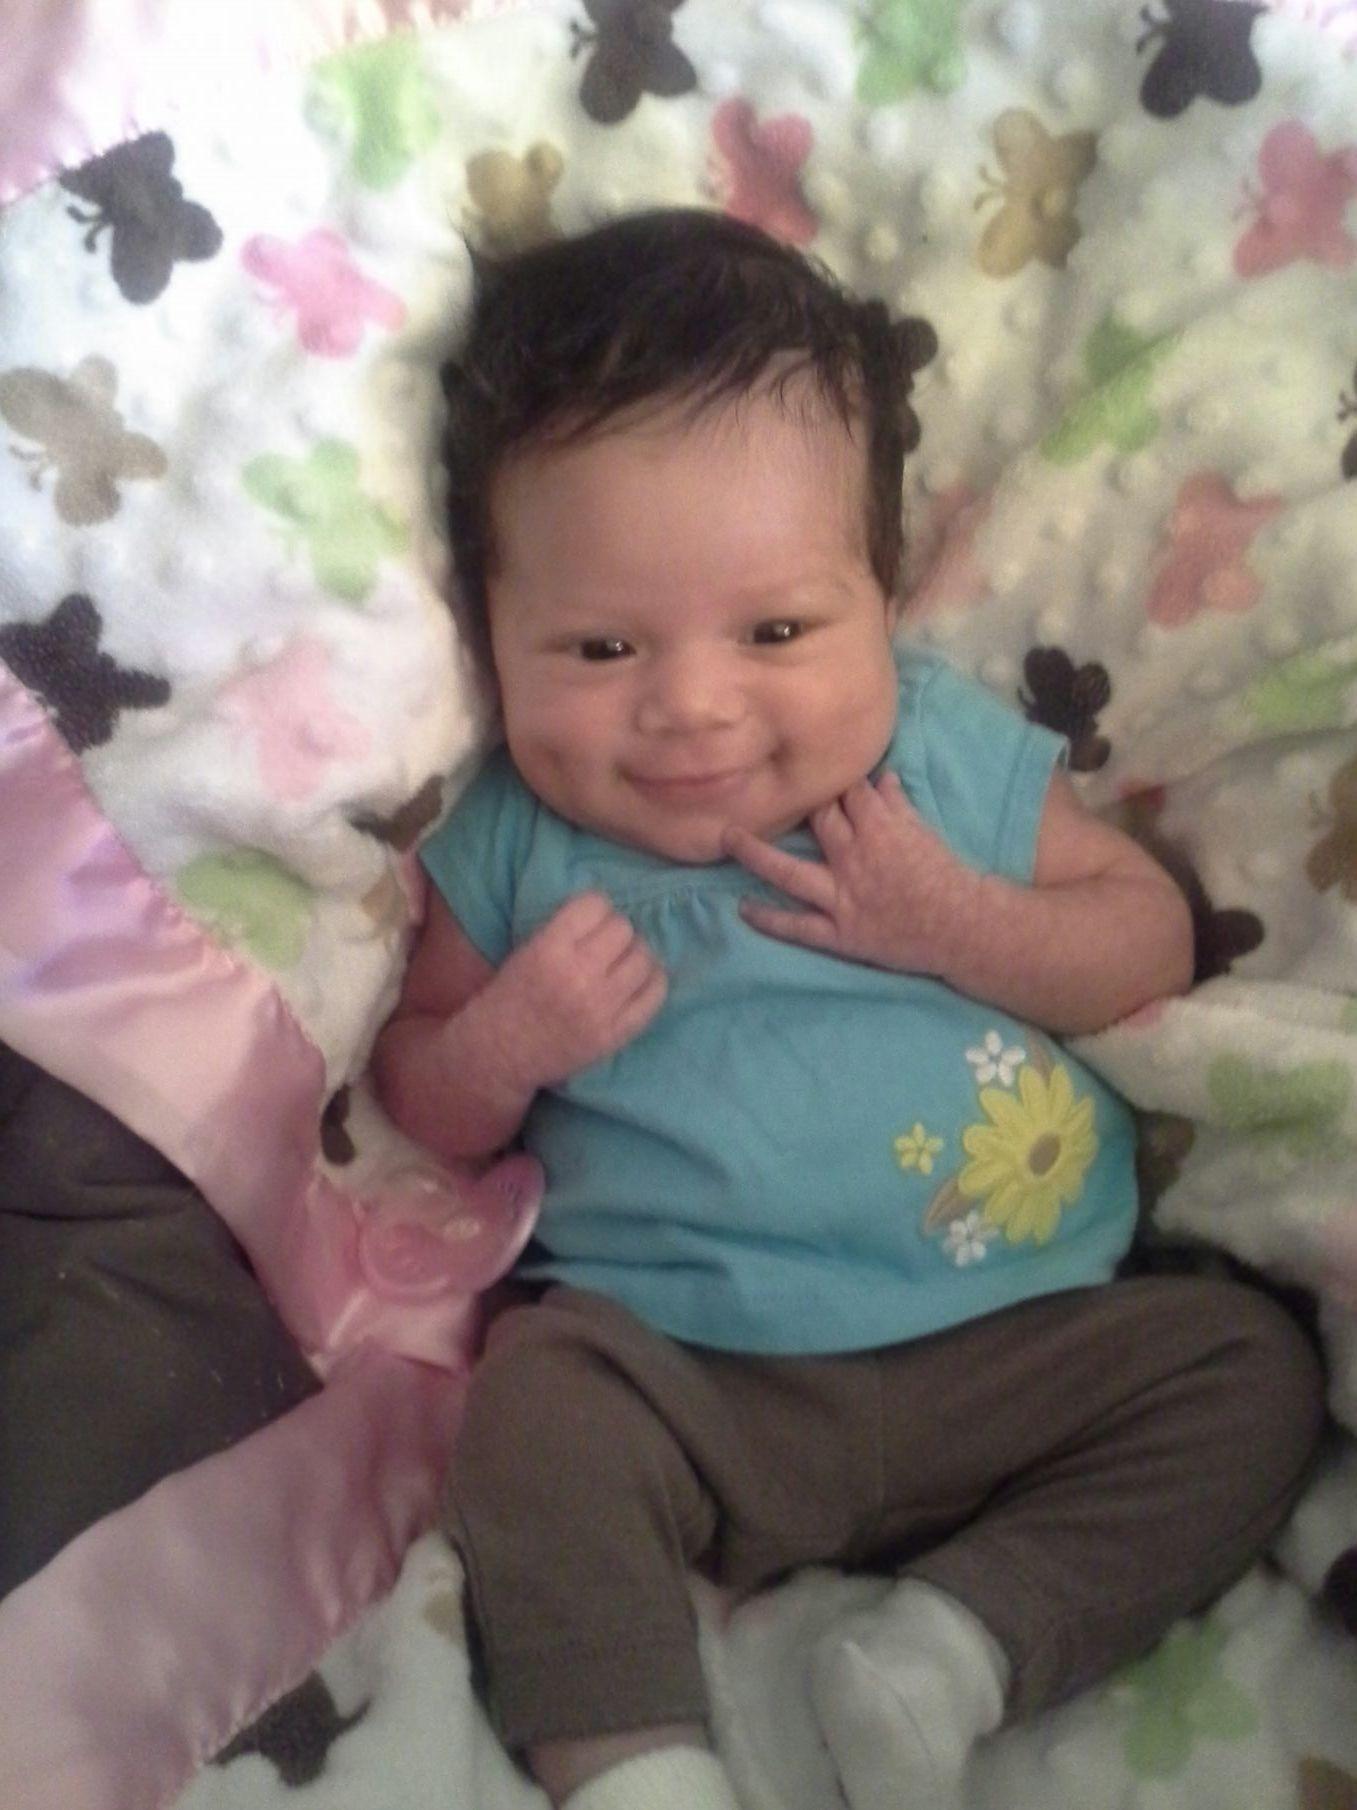 My baby cousin :)